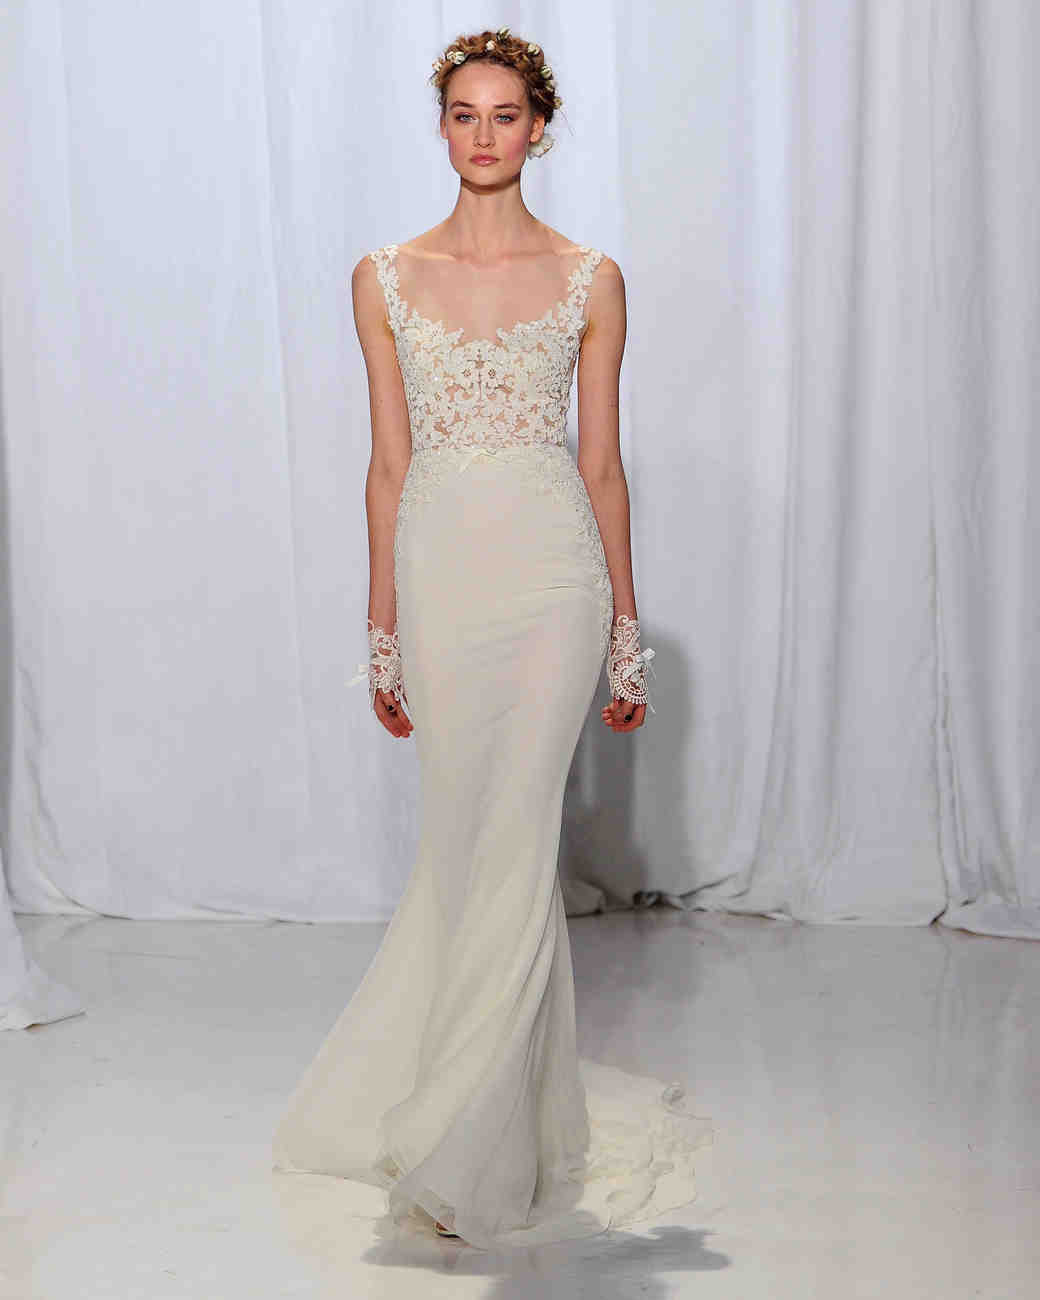 Reem Acra Wedding Dress: Reem Acra Fall 2017 Wedding Dress Collection